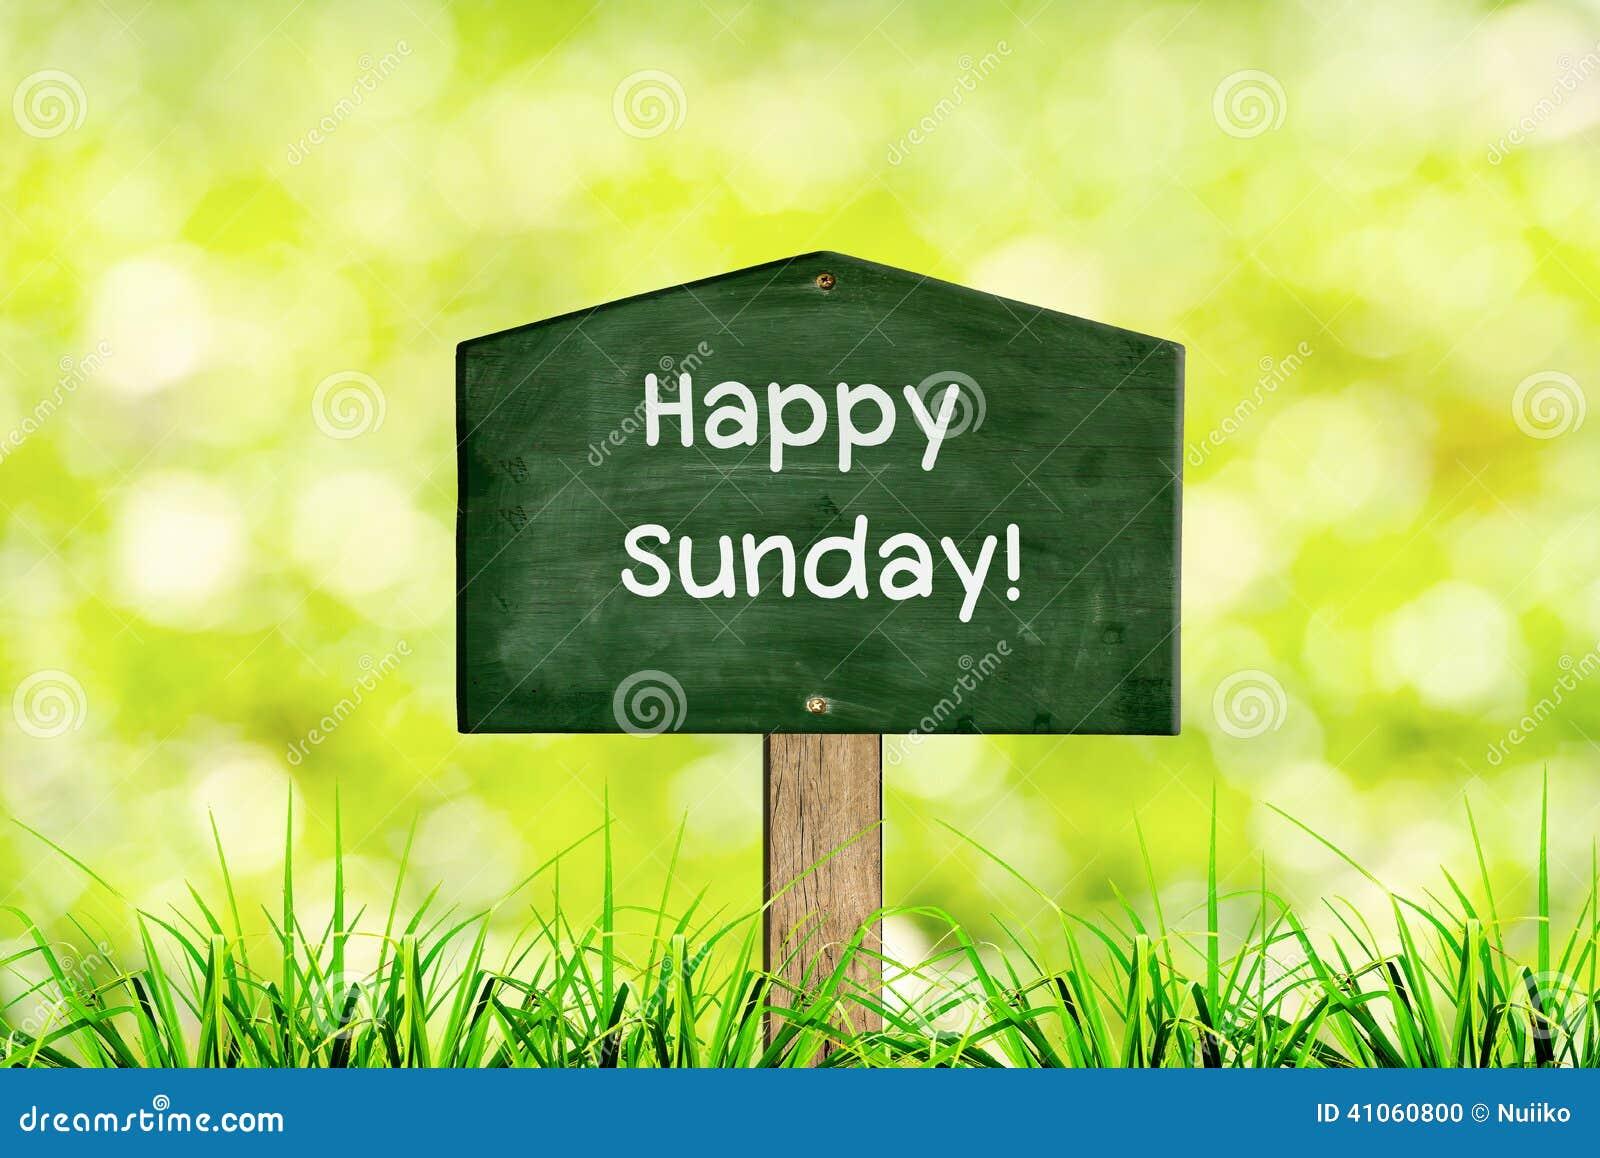 Message Happy Sunday Stock Photo